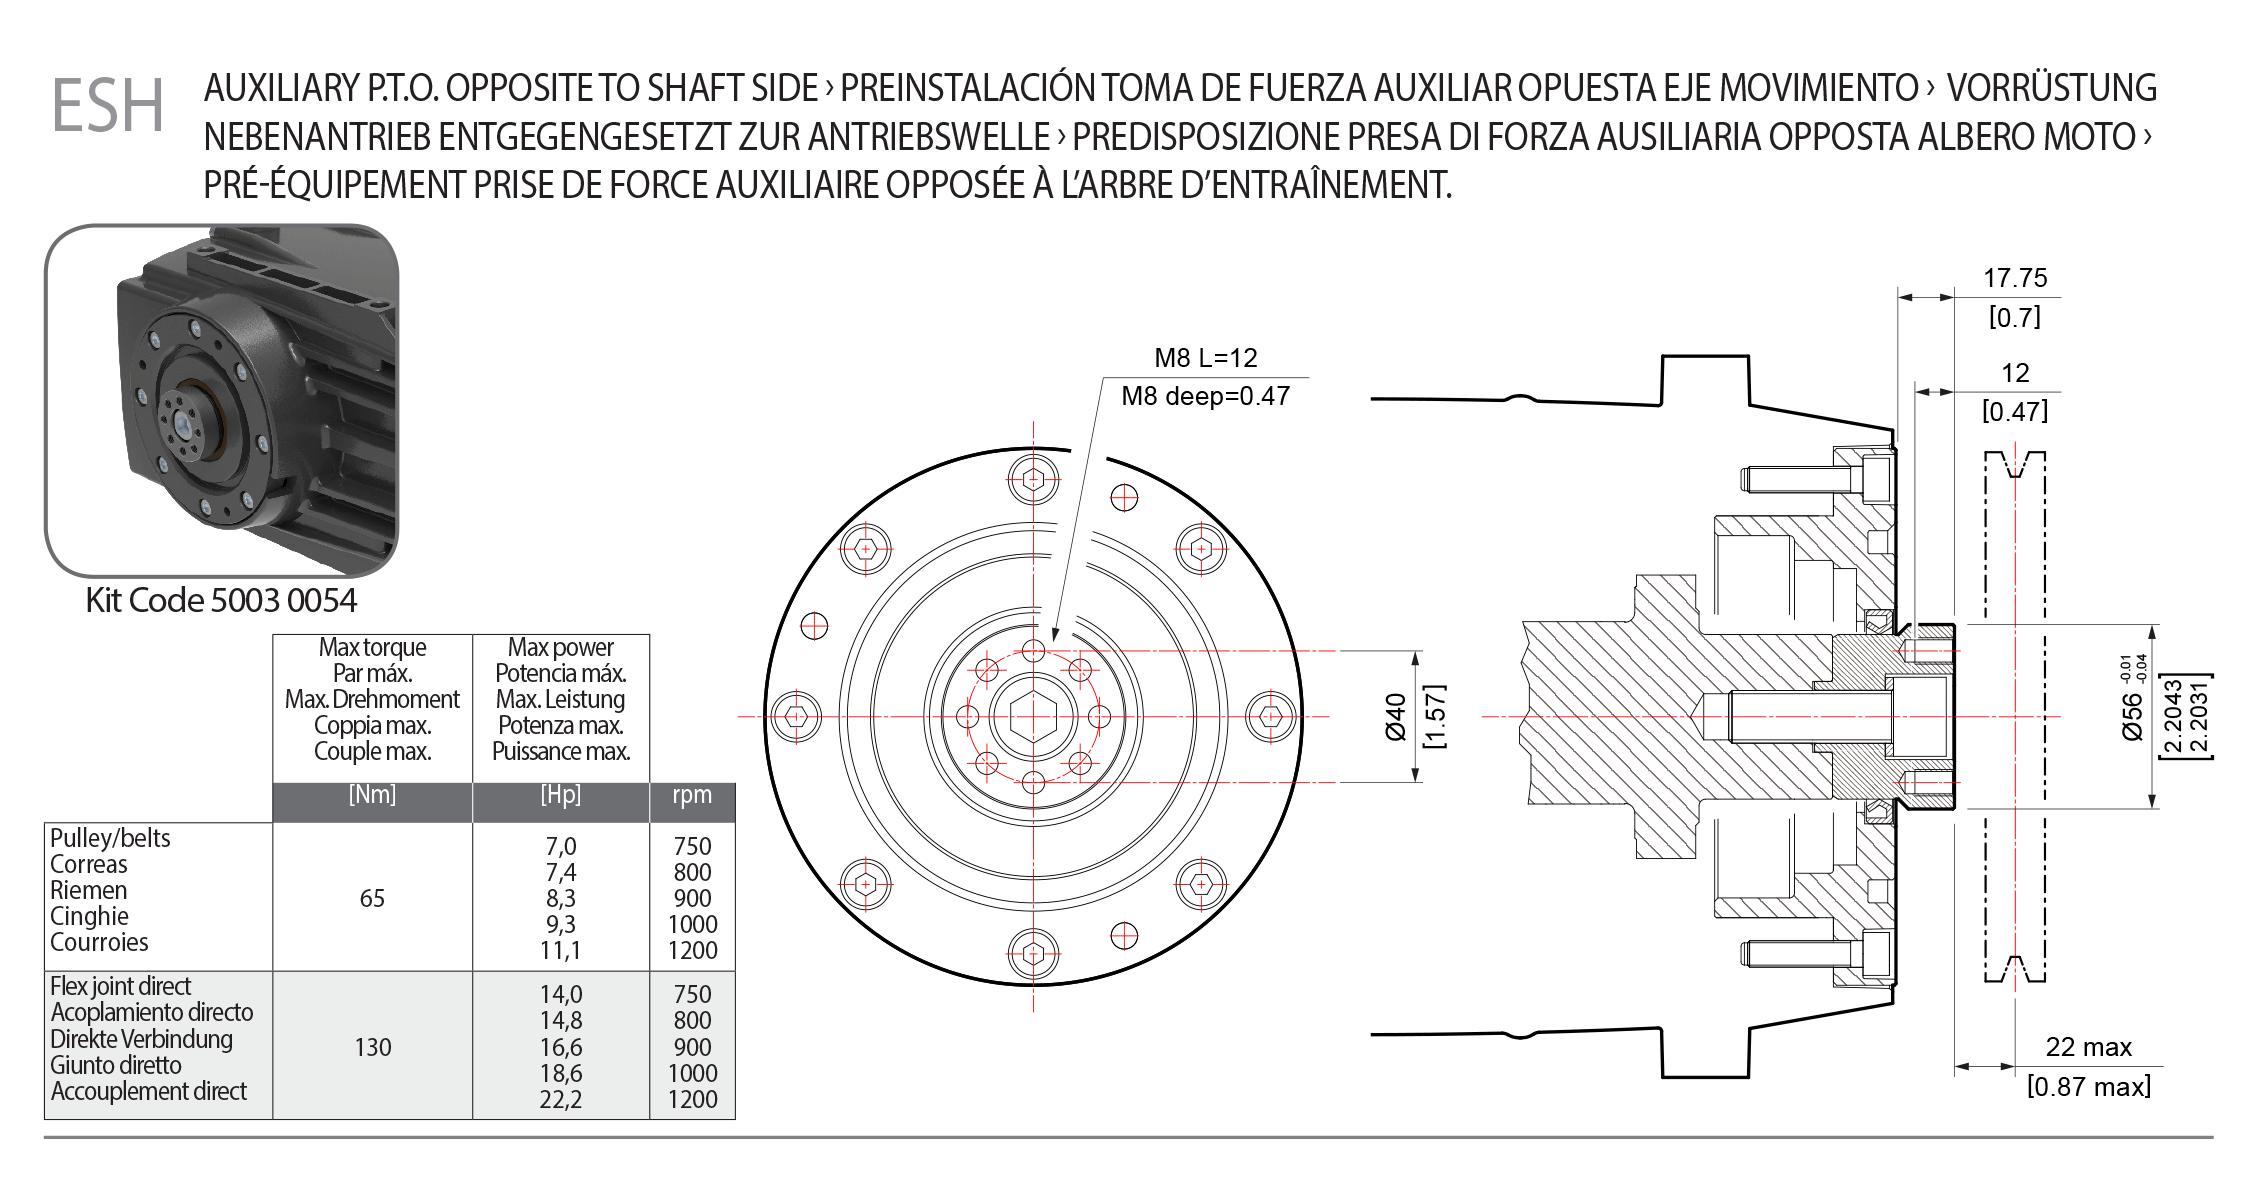 auxiliary esh hpp